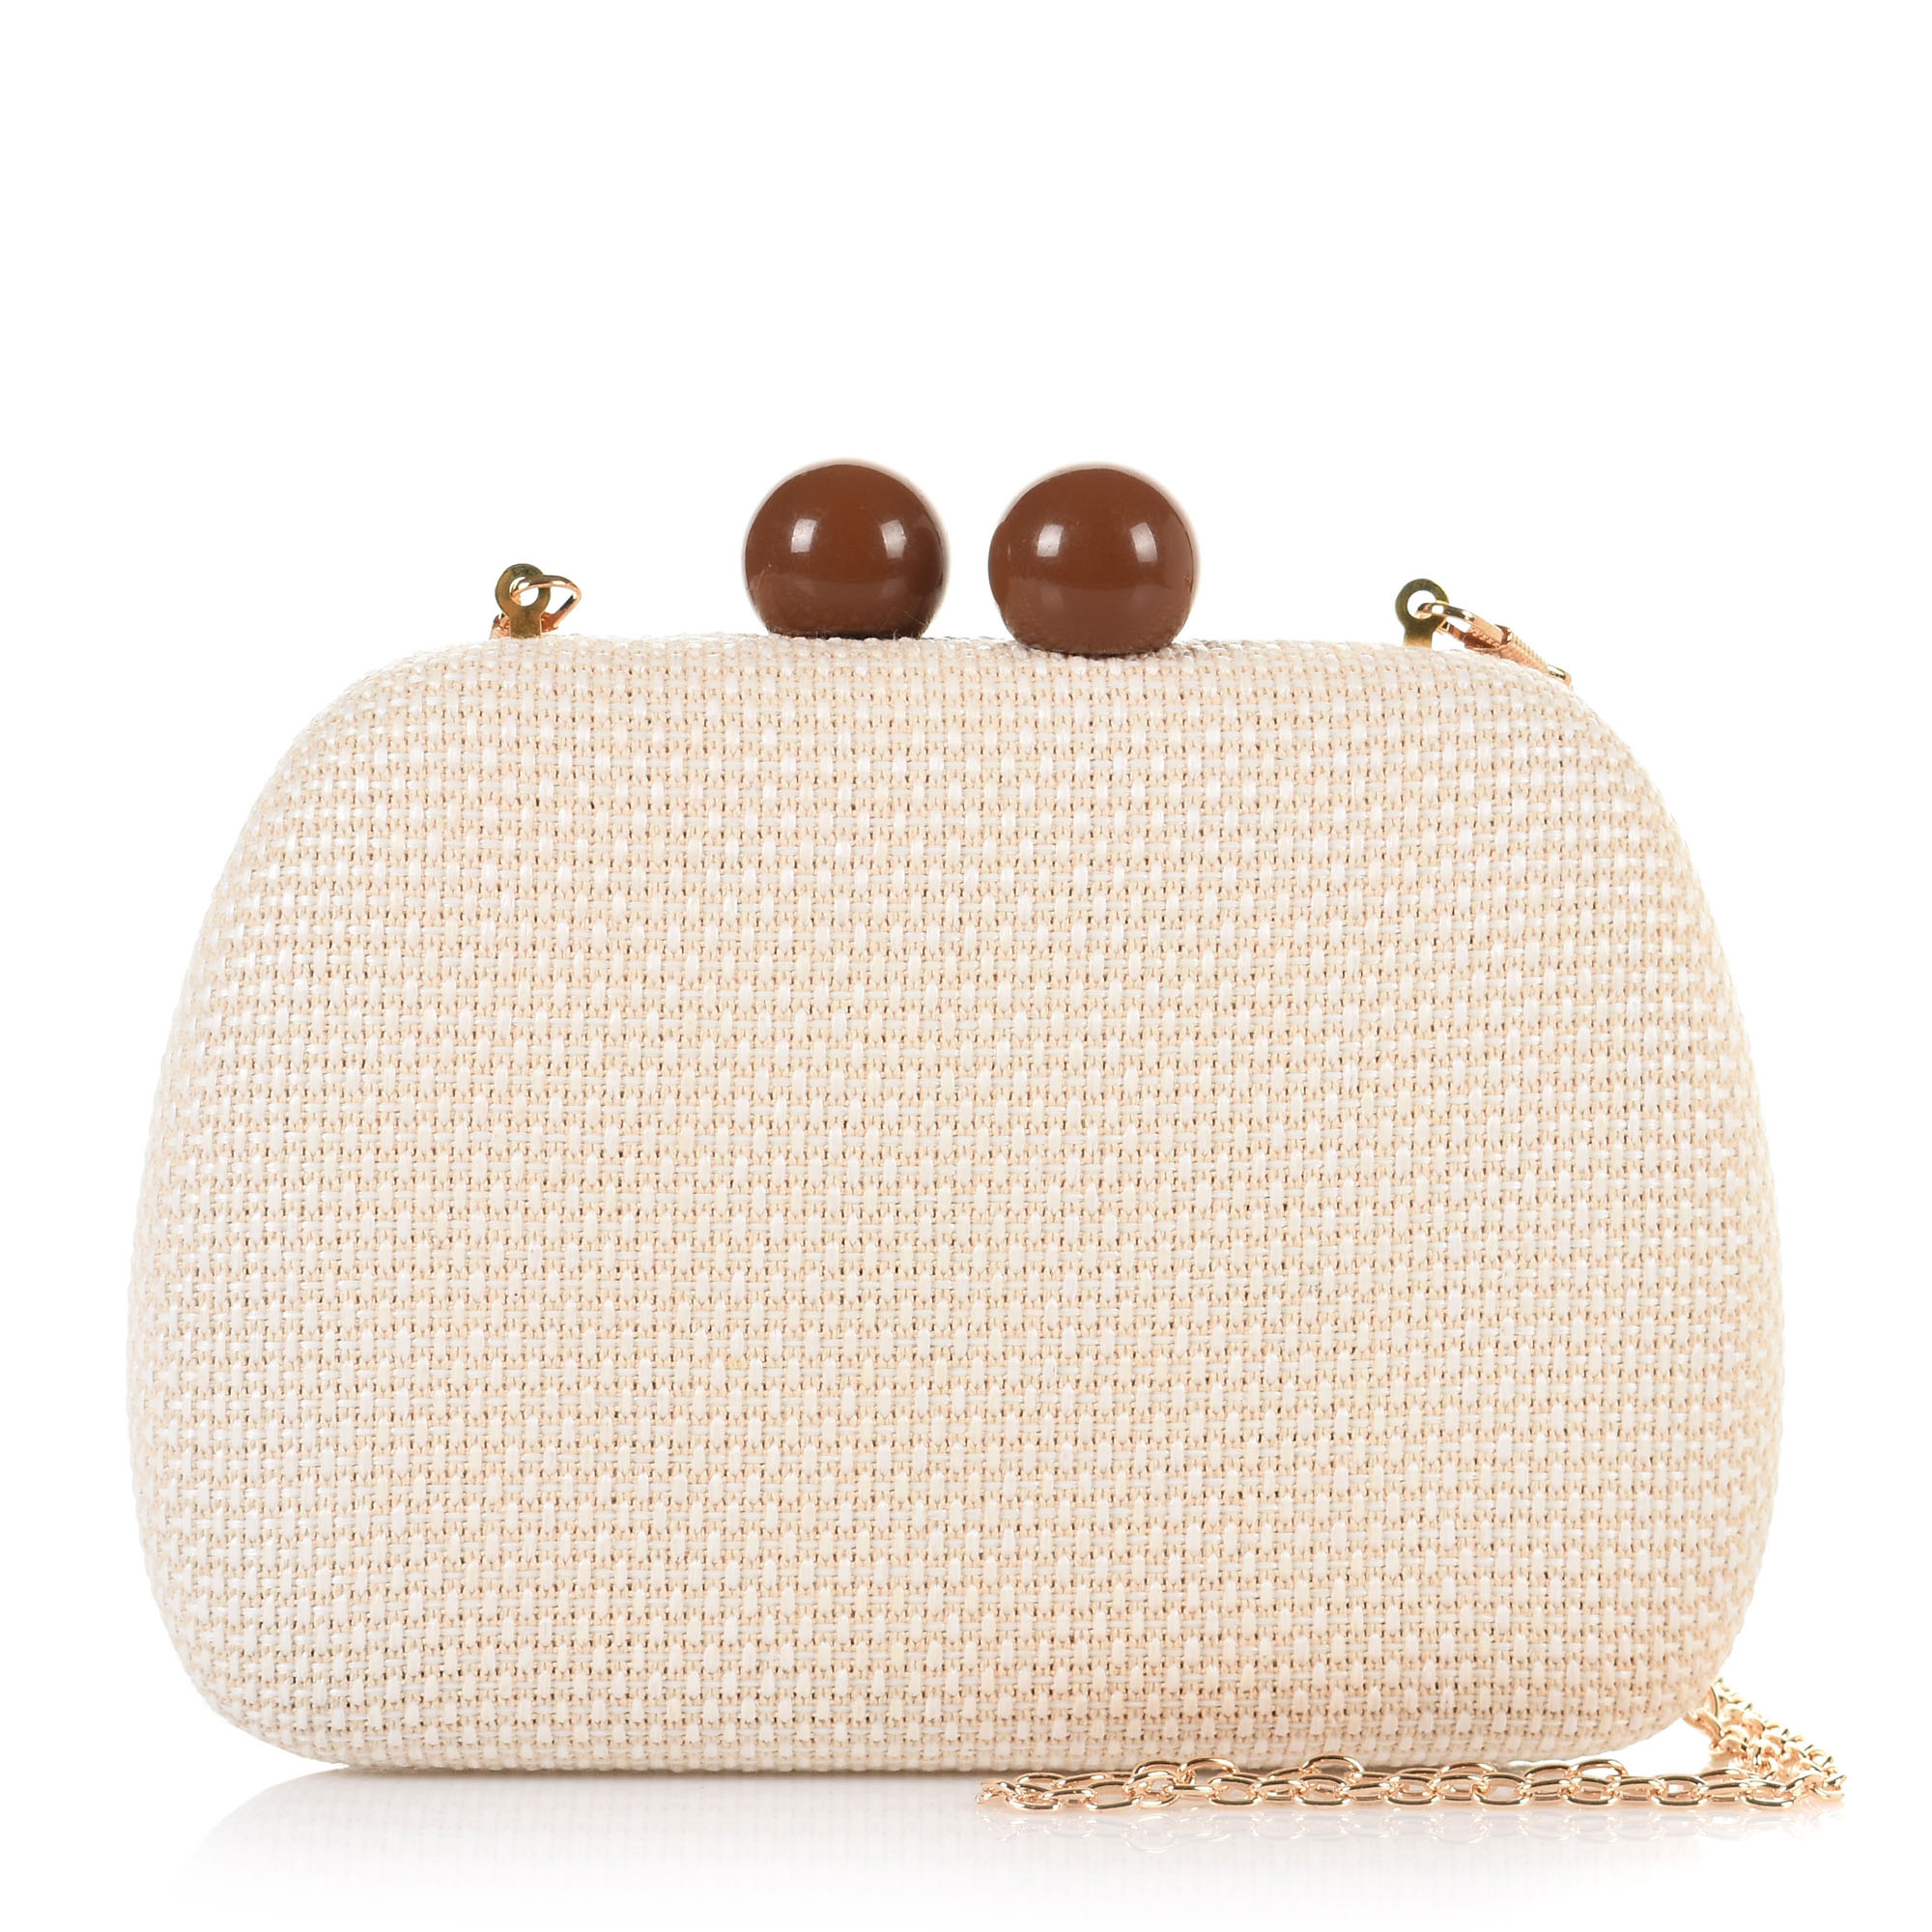 Brand Bags Clutch Brandbags Collection UA5578 0fa46c0adf8